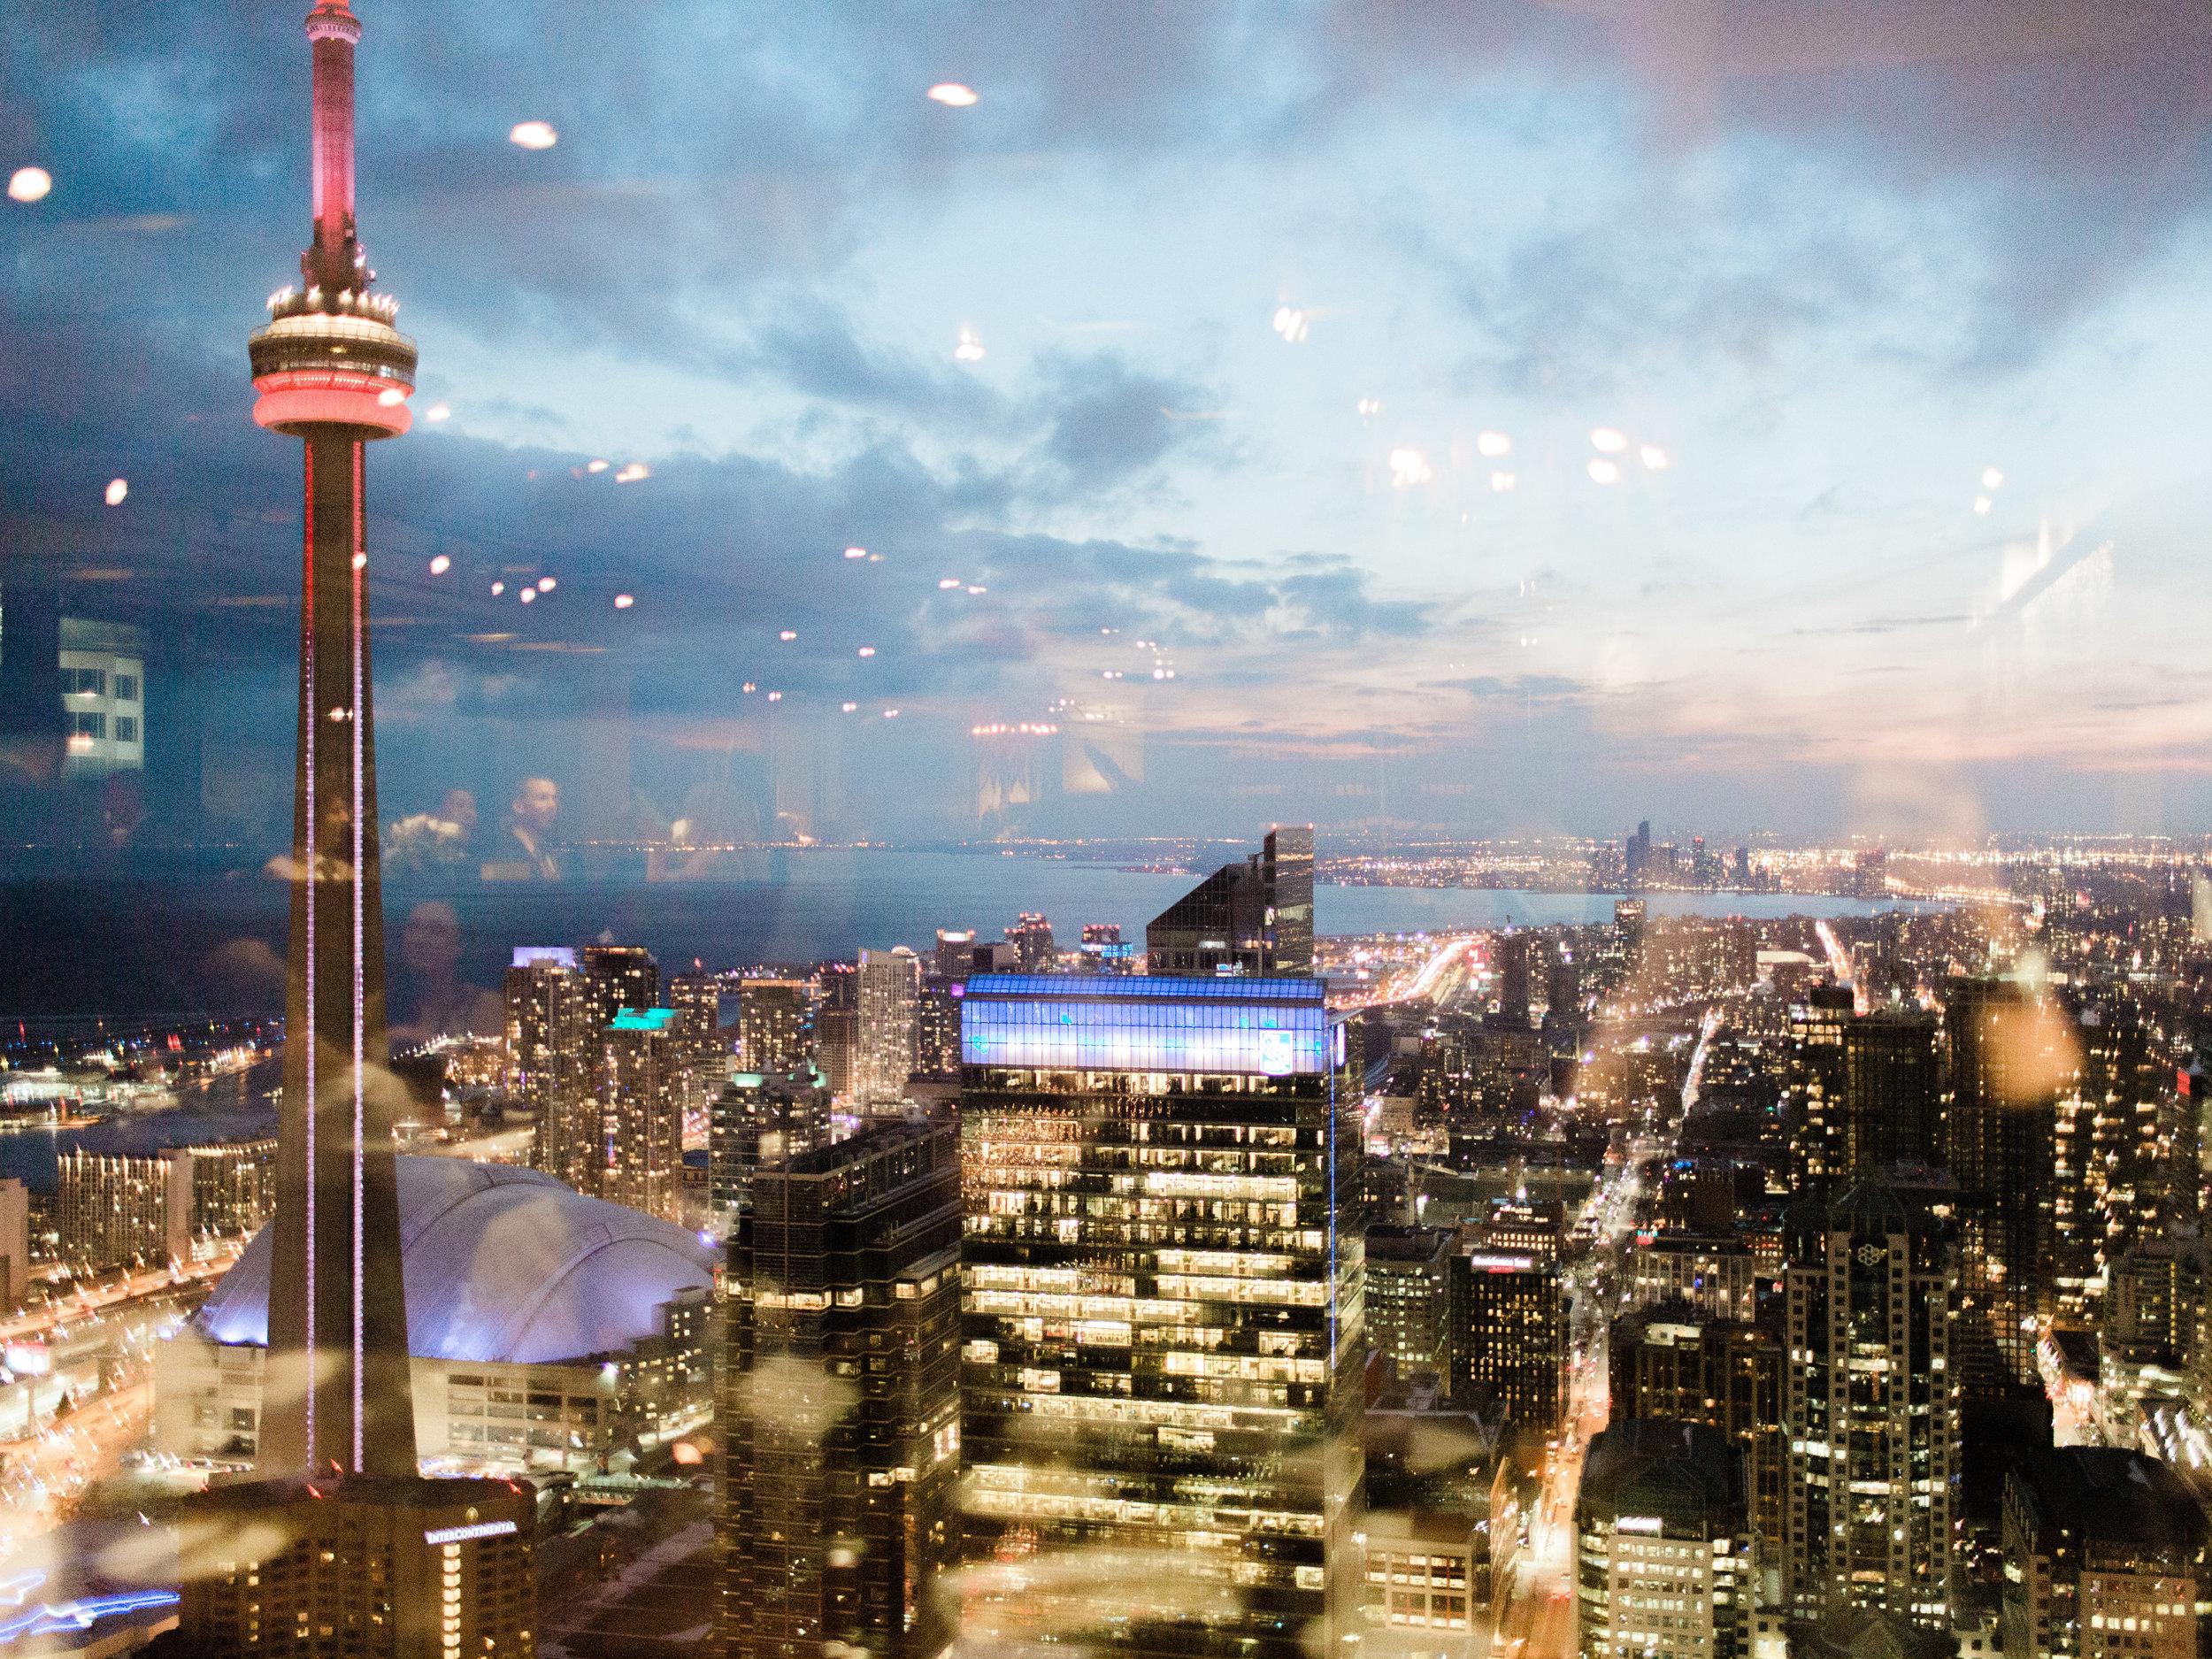 Toronto-wedding-photographer-downtown-winter-wedding-intimate-restaurant-canoe158.jpg